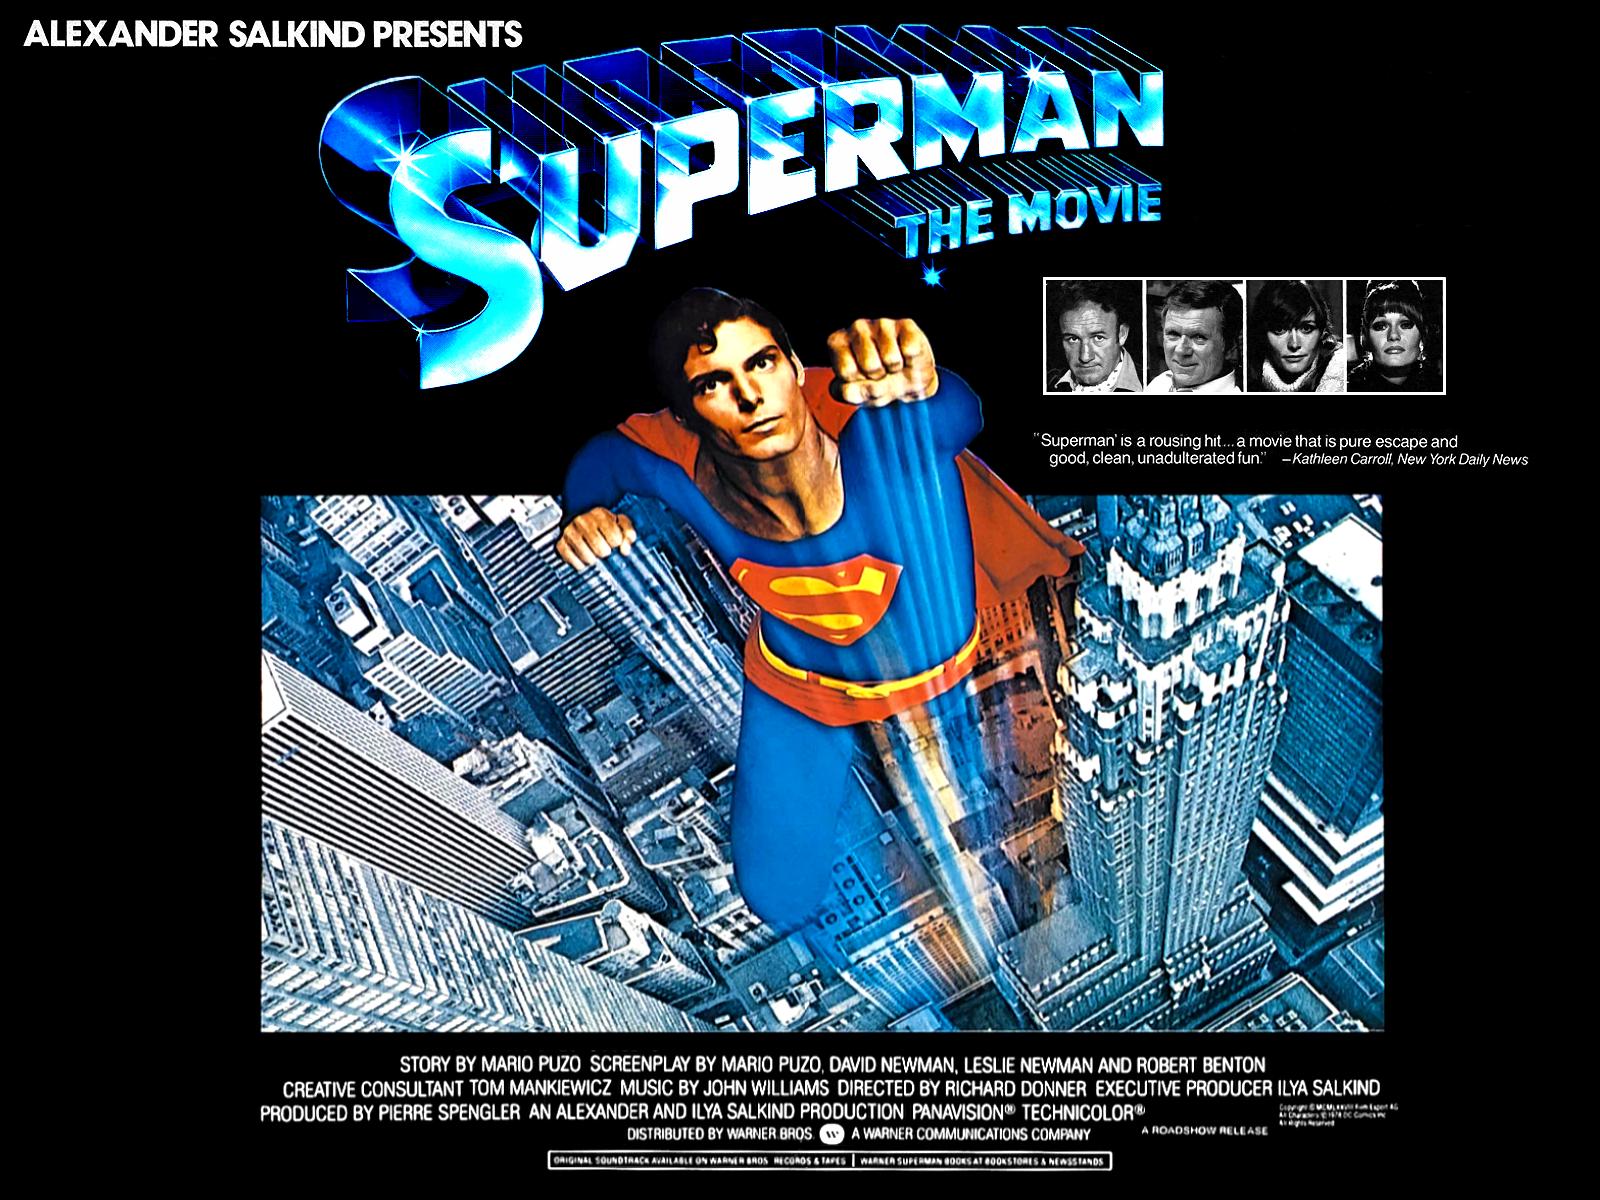 1600x1200 Superman the Movie desktop PC and Mac wallpaper 1600x1200